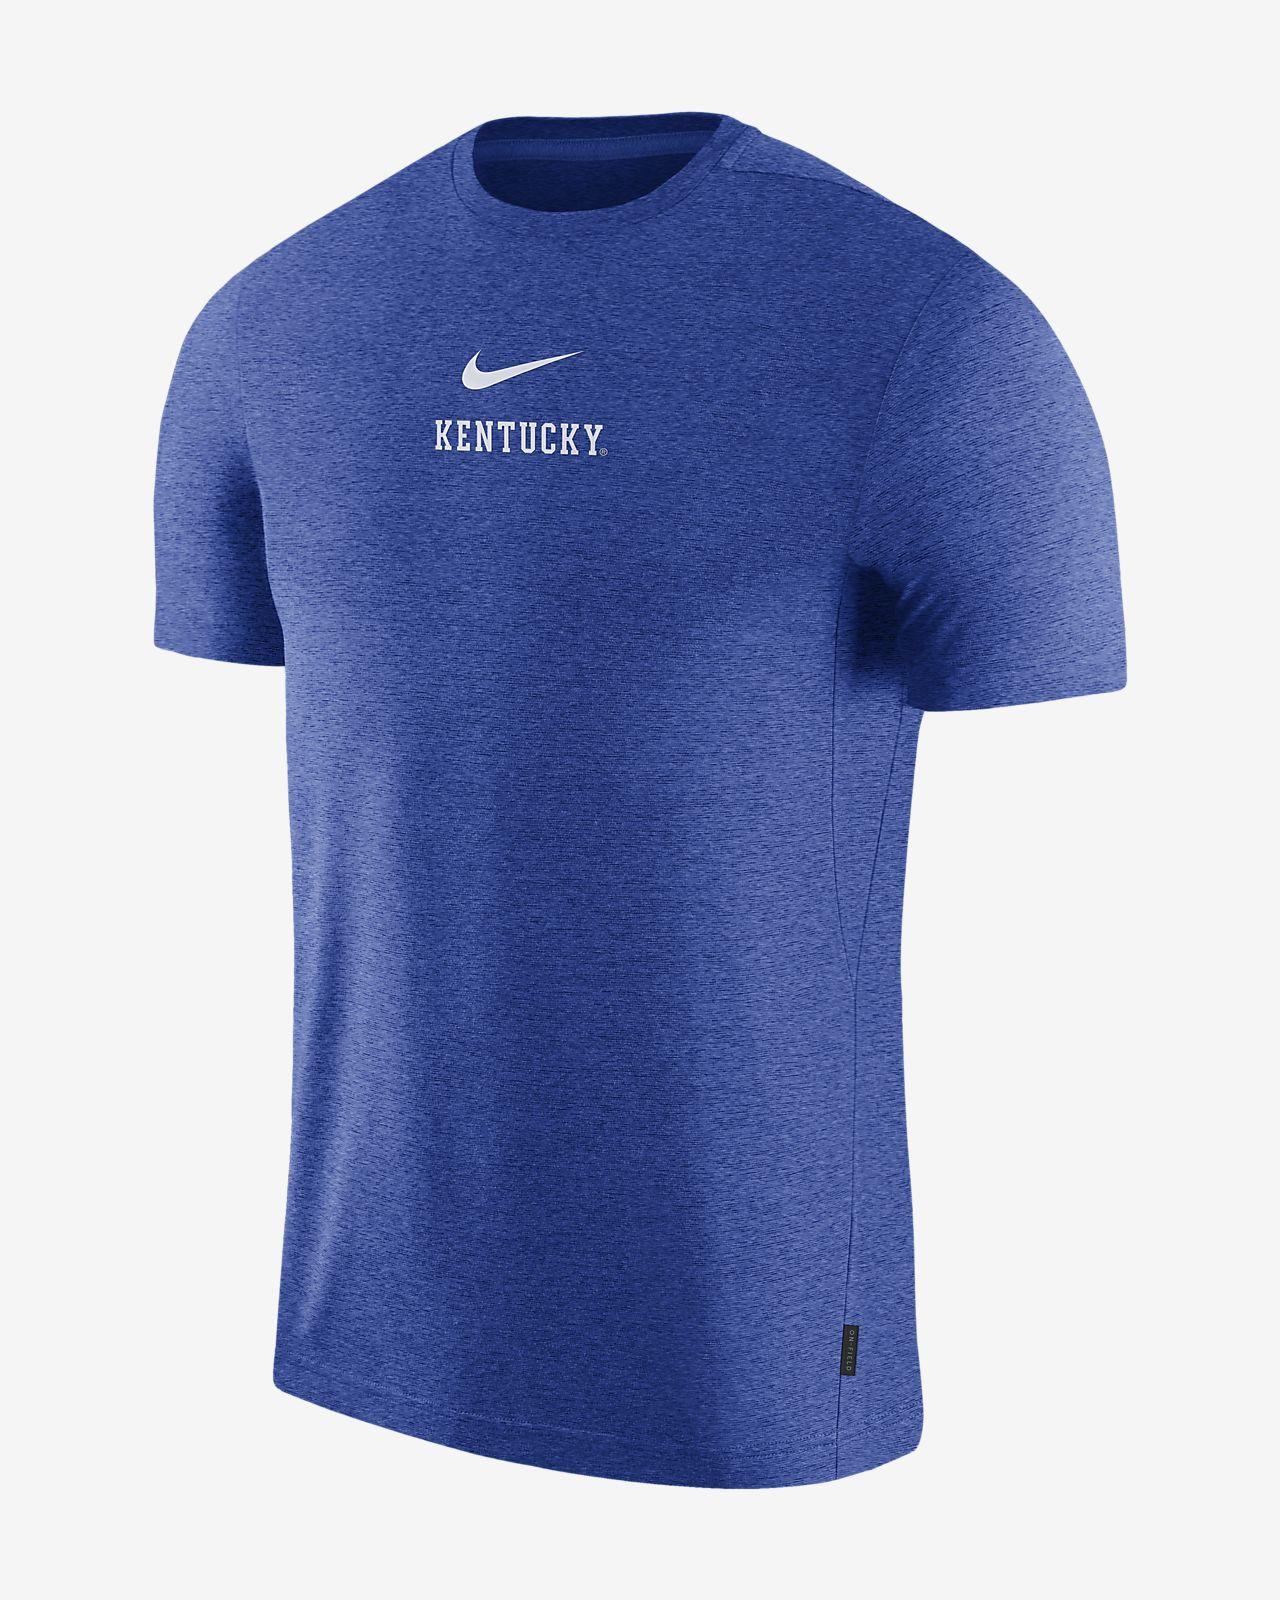 Nike College Dri-FIT Coach (Kentucky) Men's Short-Sleeve Top